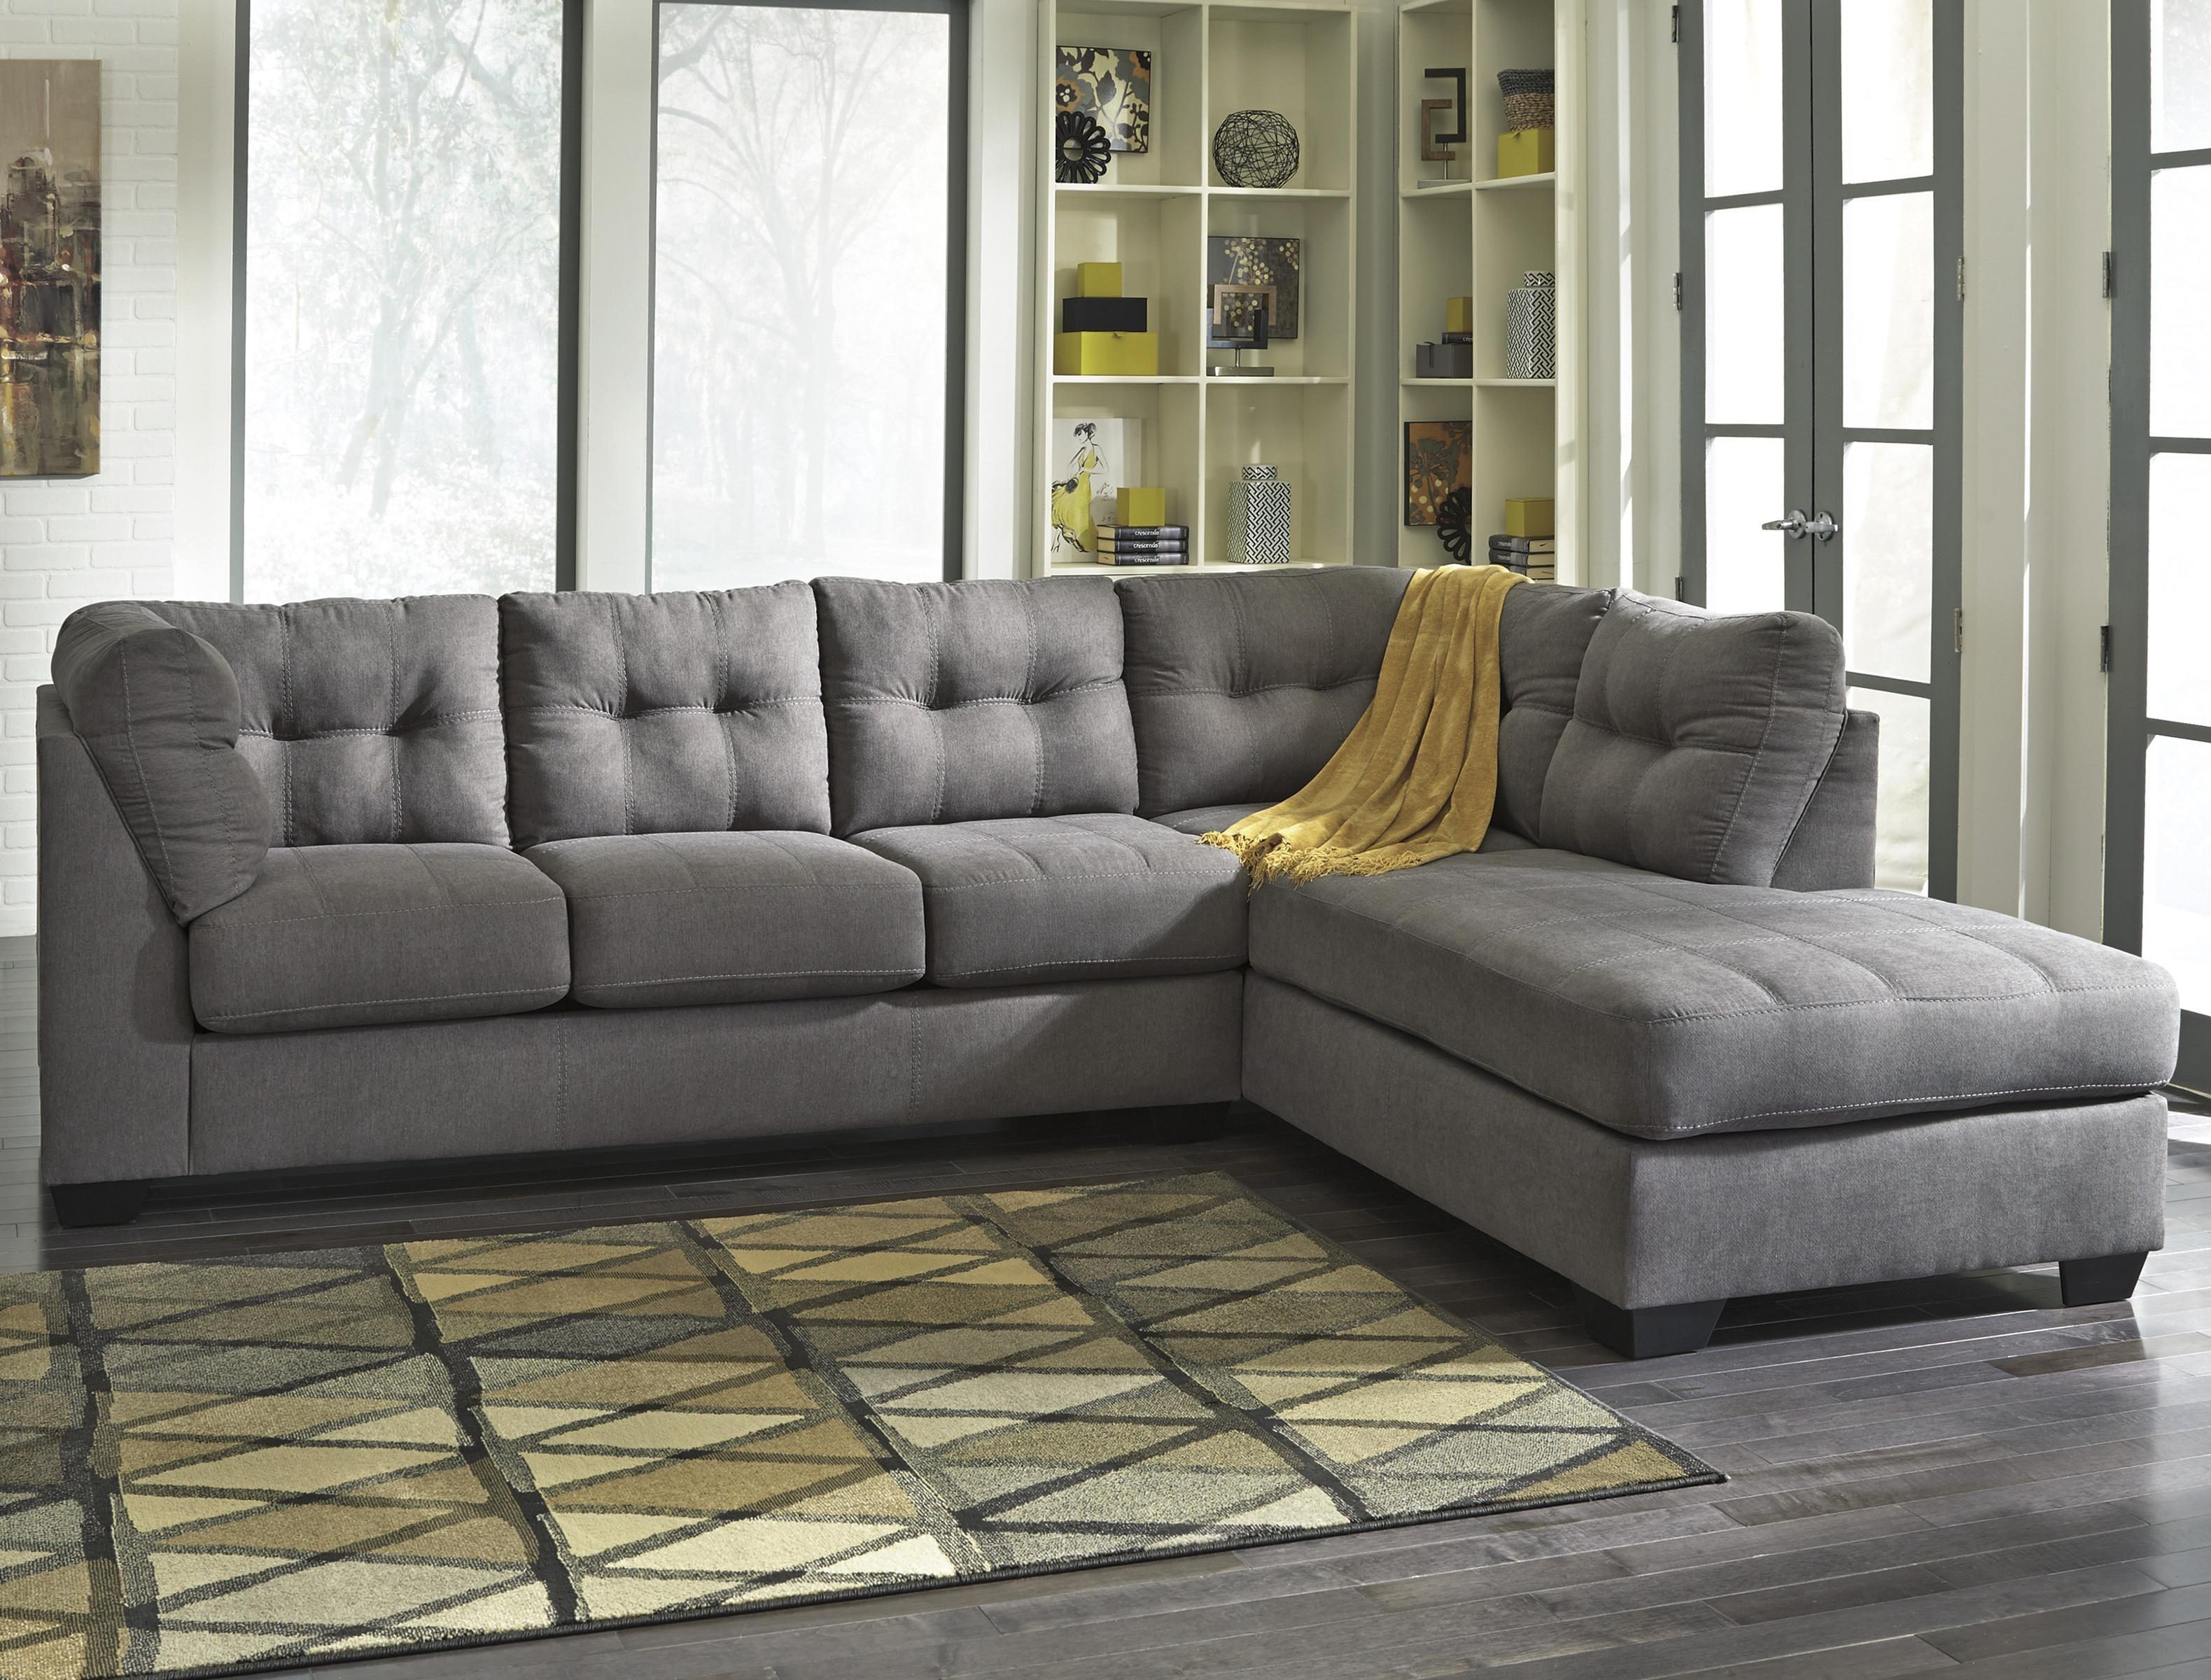 3 Piece Sectional Sleeper Sofa - Hotelsbacau regarding 3 Piece Sectional Sleeper Sofas (Image 2 of 10)